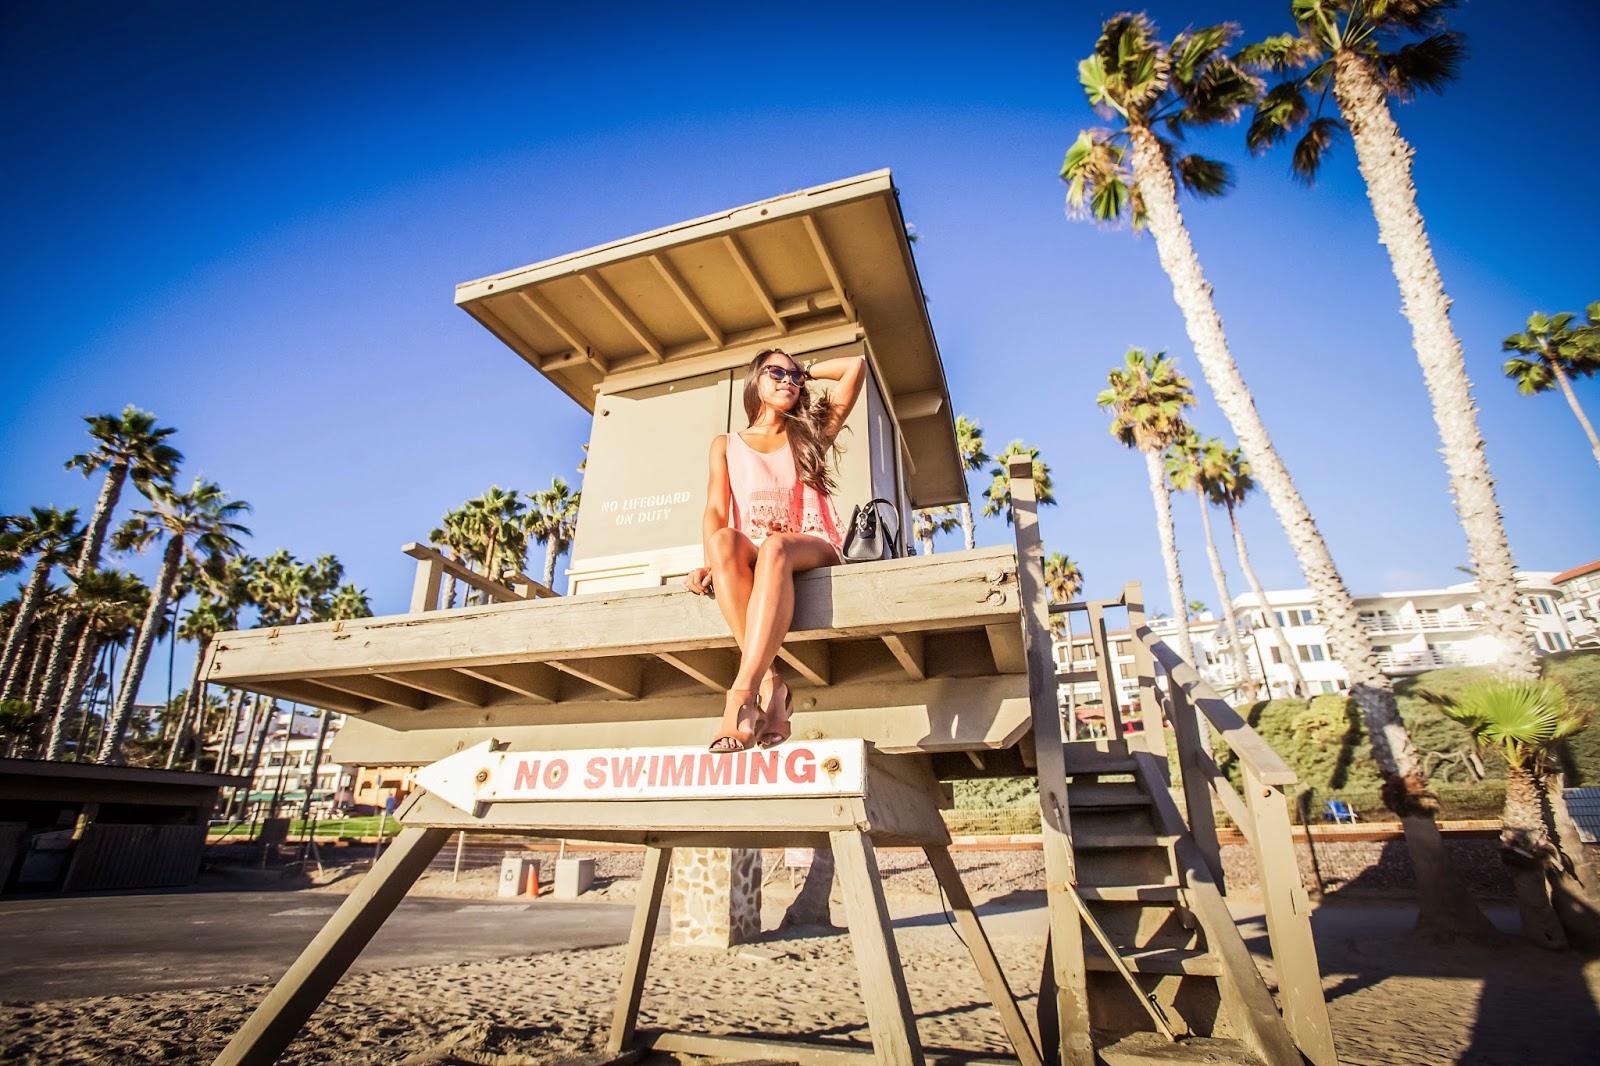 The San Clemente Beach Scene